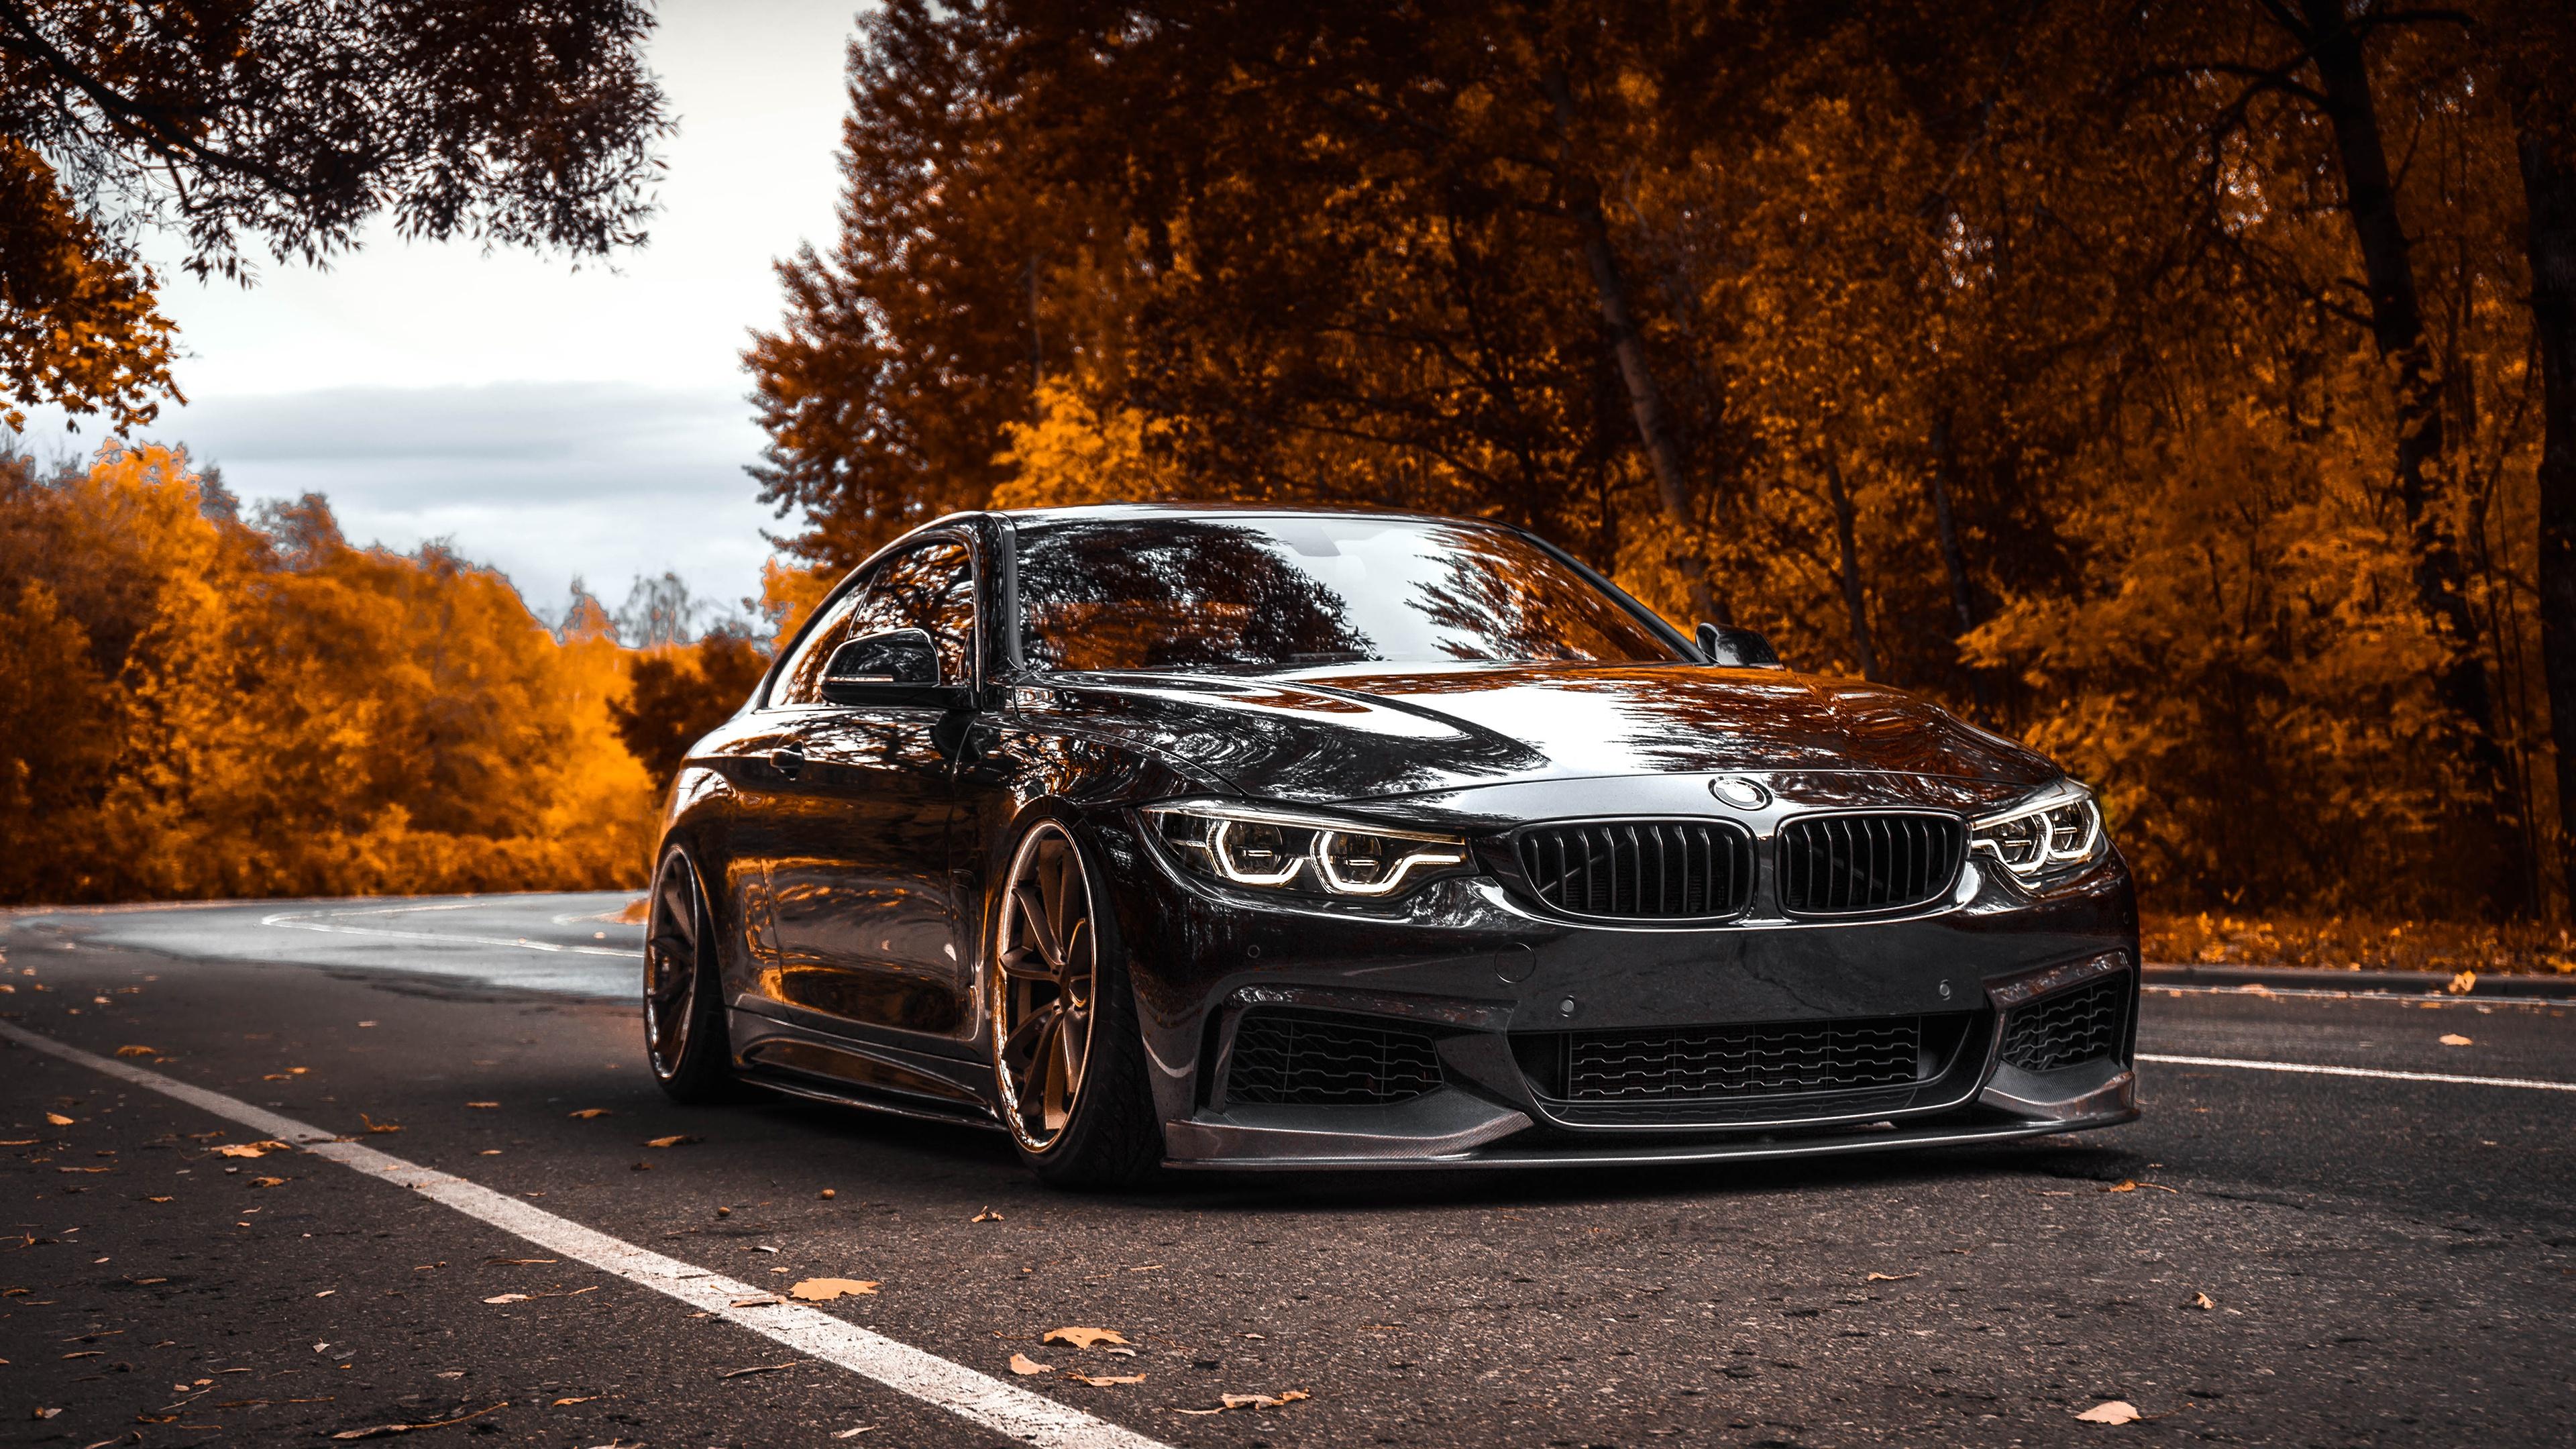 BMW Tuning 4 Series Black Metallic 4k, HD Cars, 4k ...